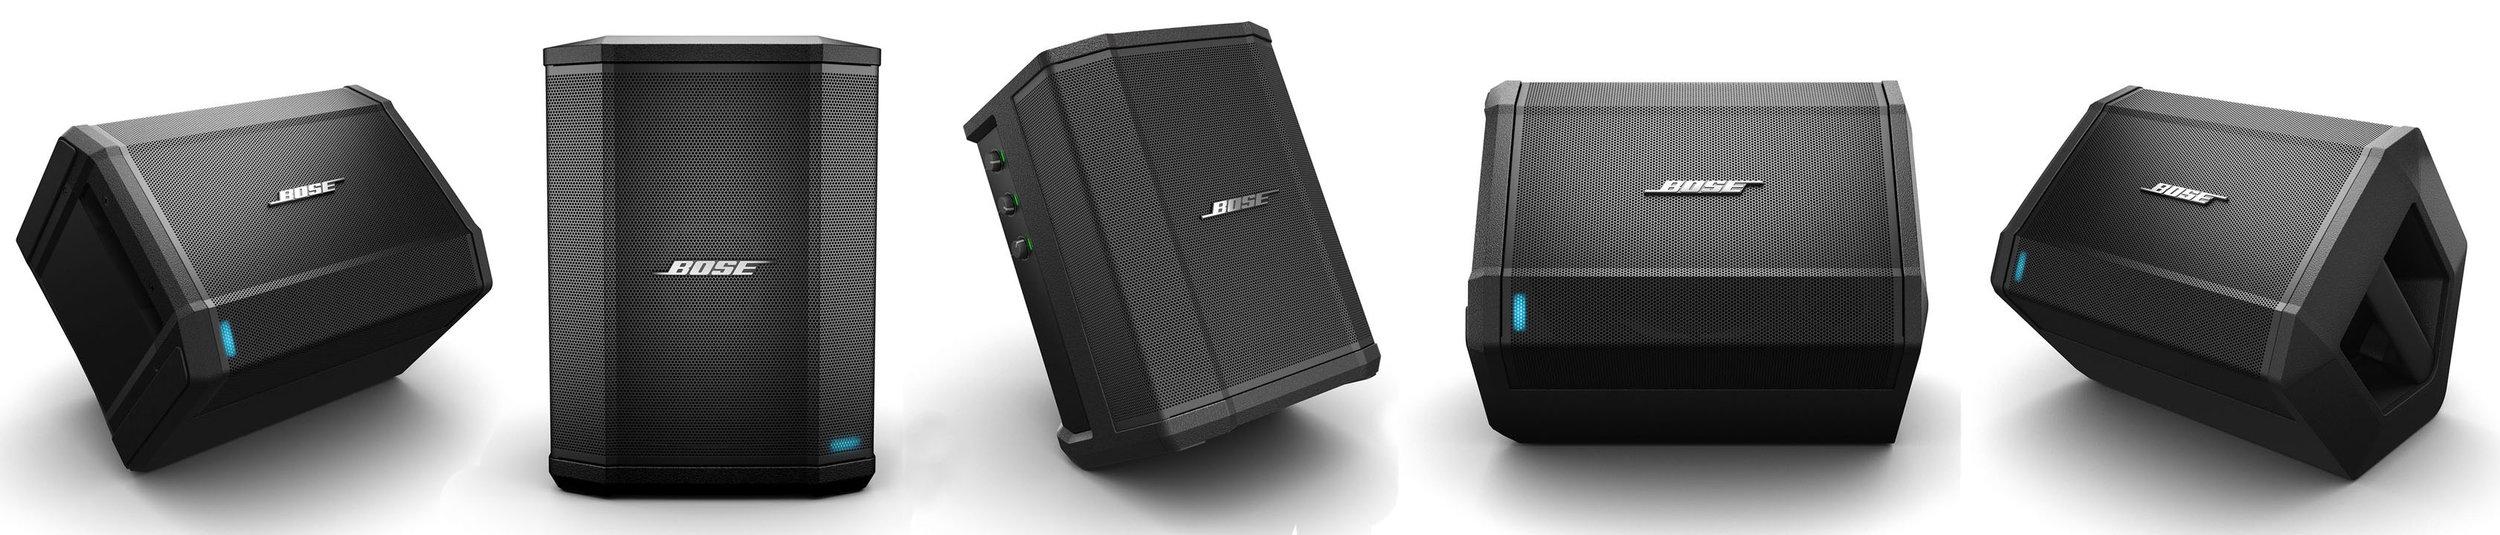 bose-s1-pro-portable-pa-system-speaker-review.jpg